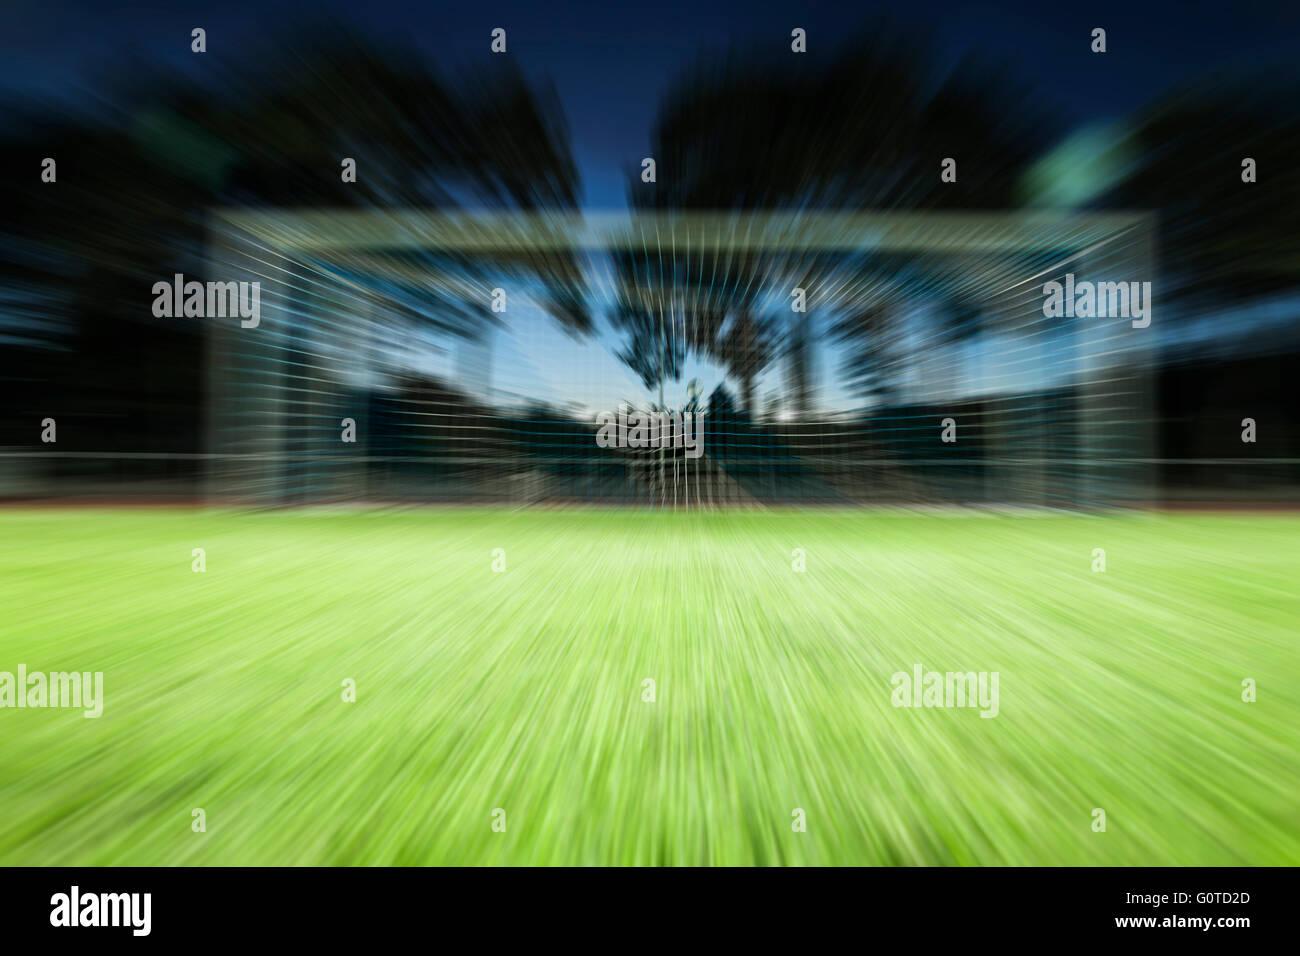 Football goal background - Stock Image